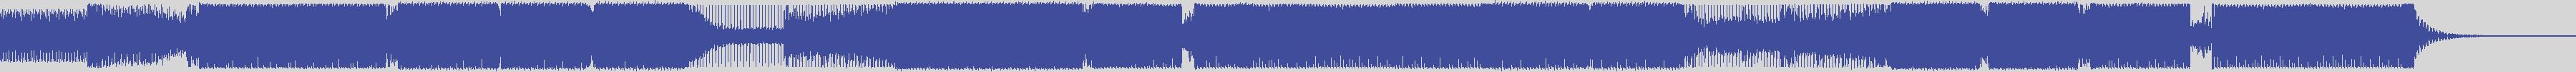 just_digital_records [smile1112] Kabal - Rum & Bass [Original Mix] audio wave form